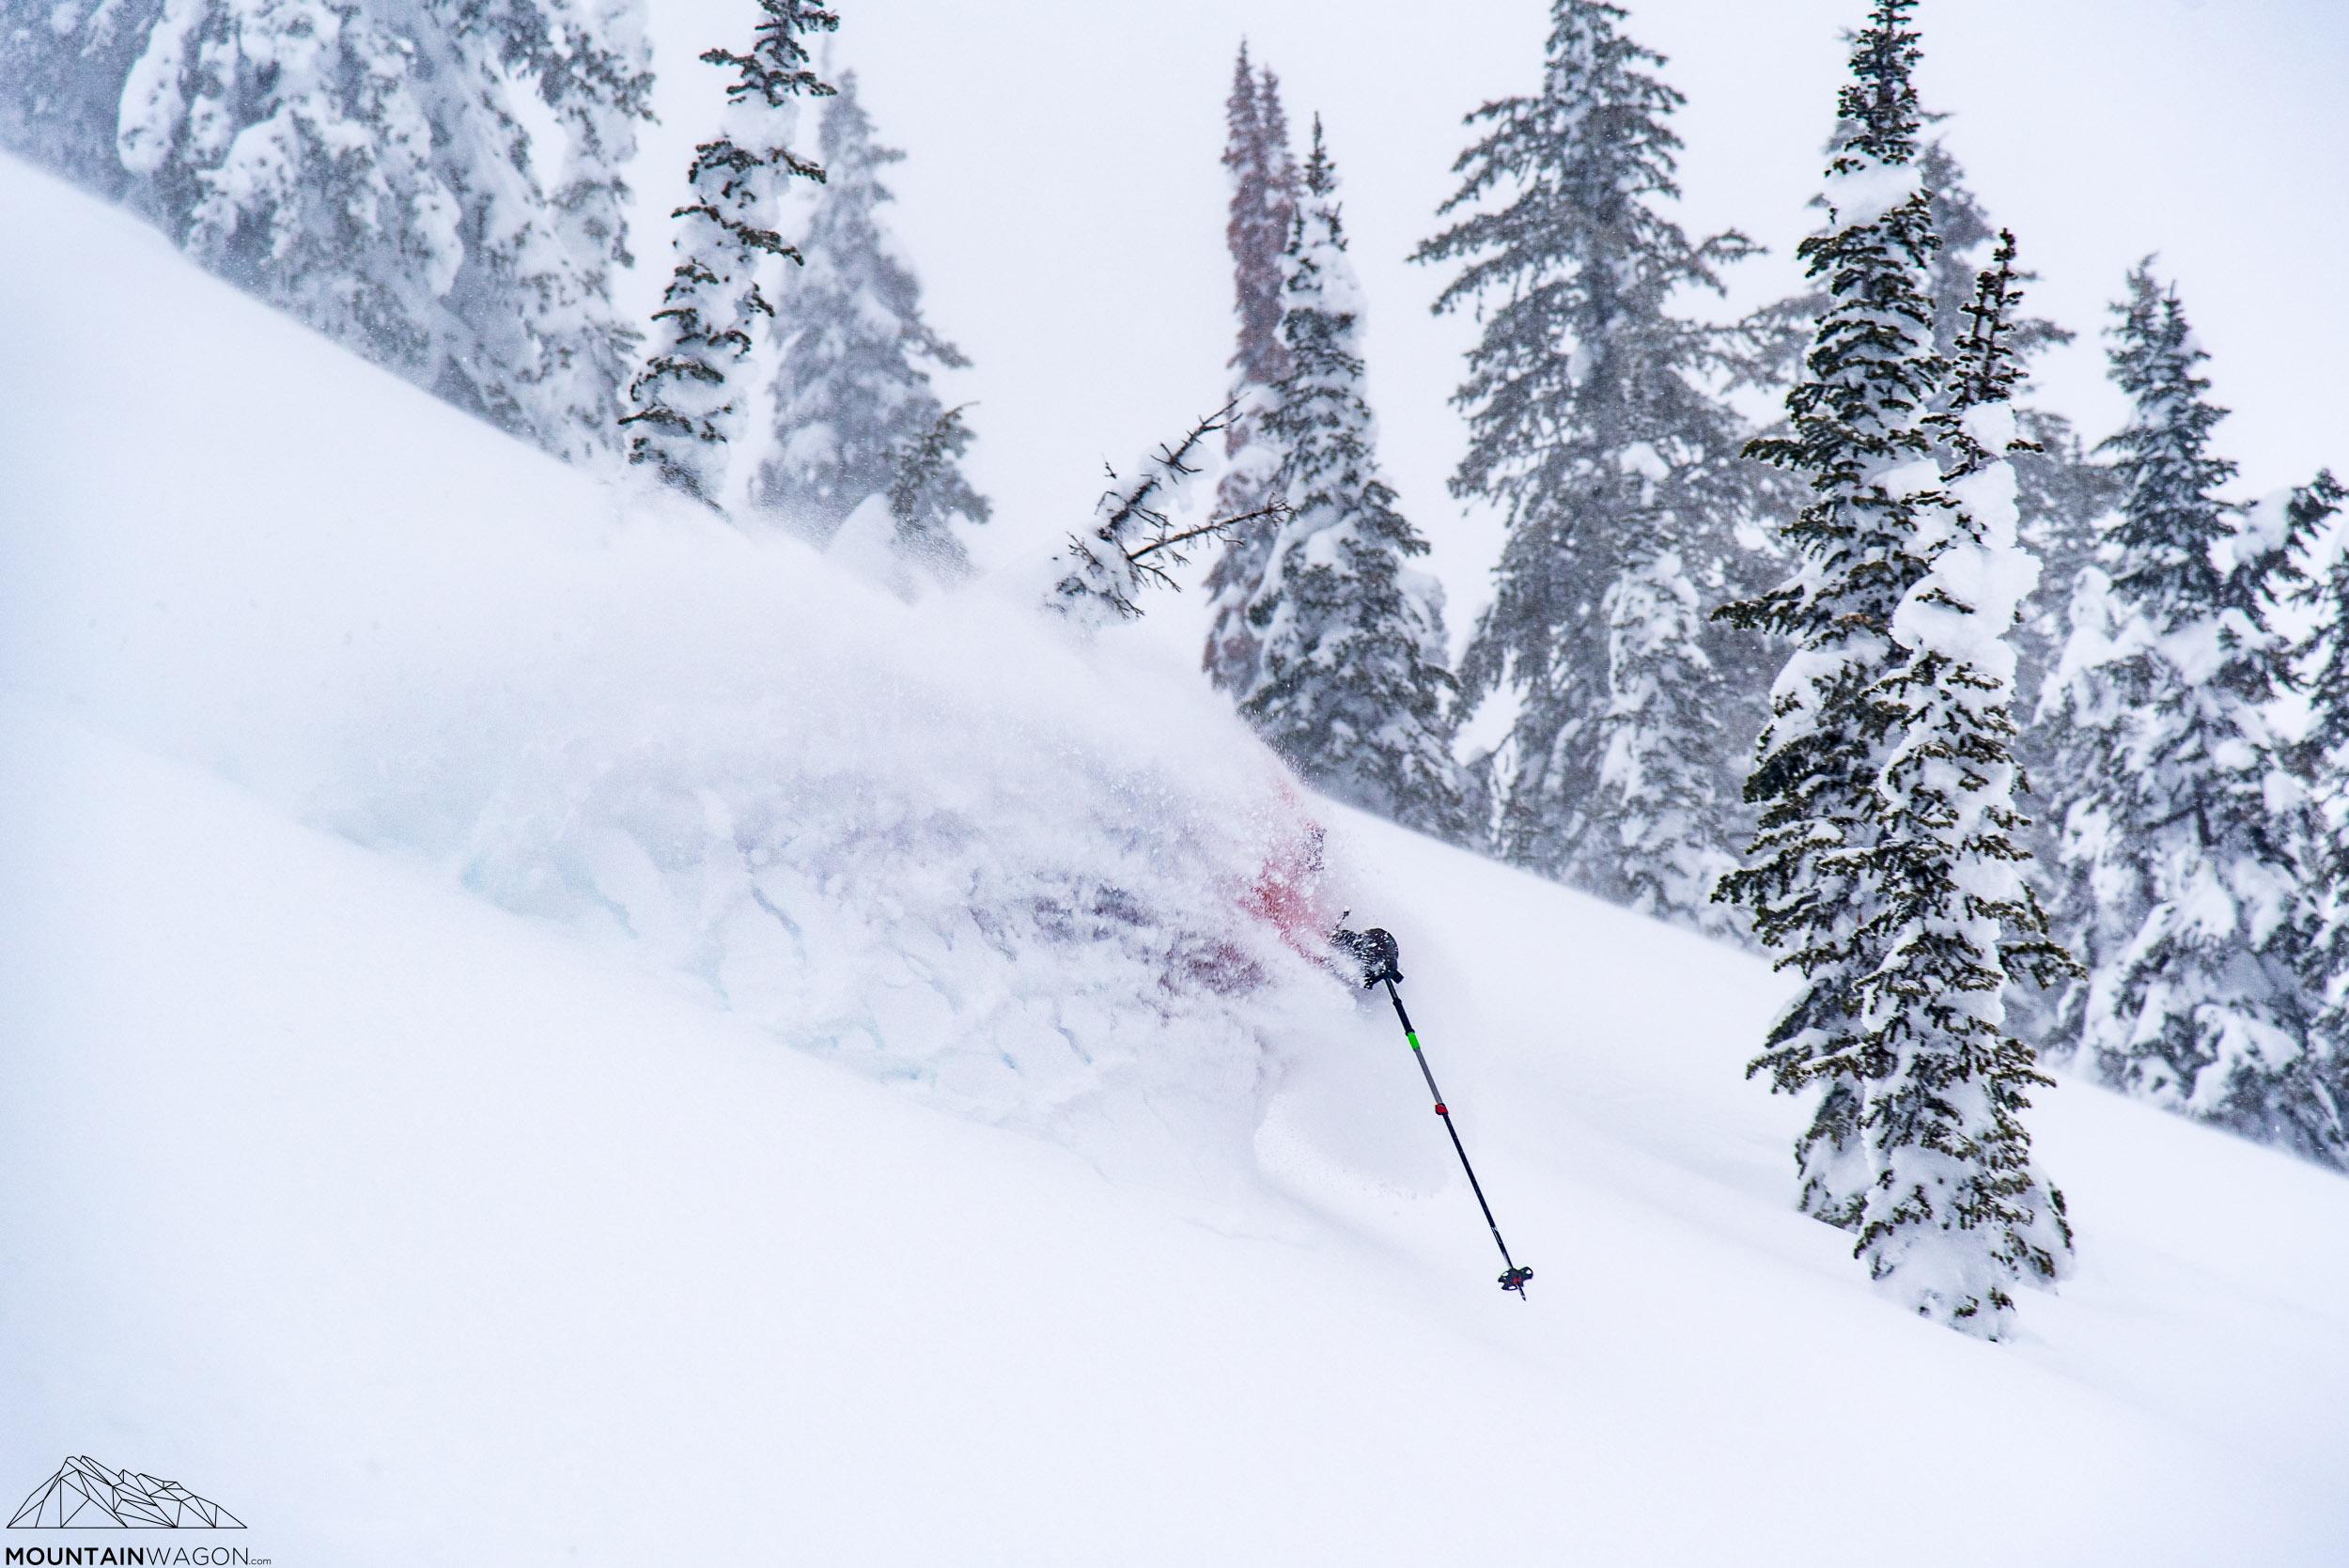 Kootenay pass powder skiing